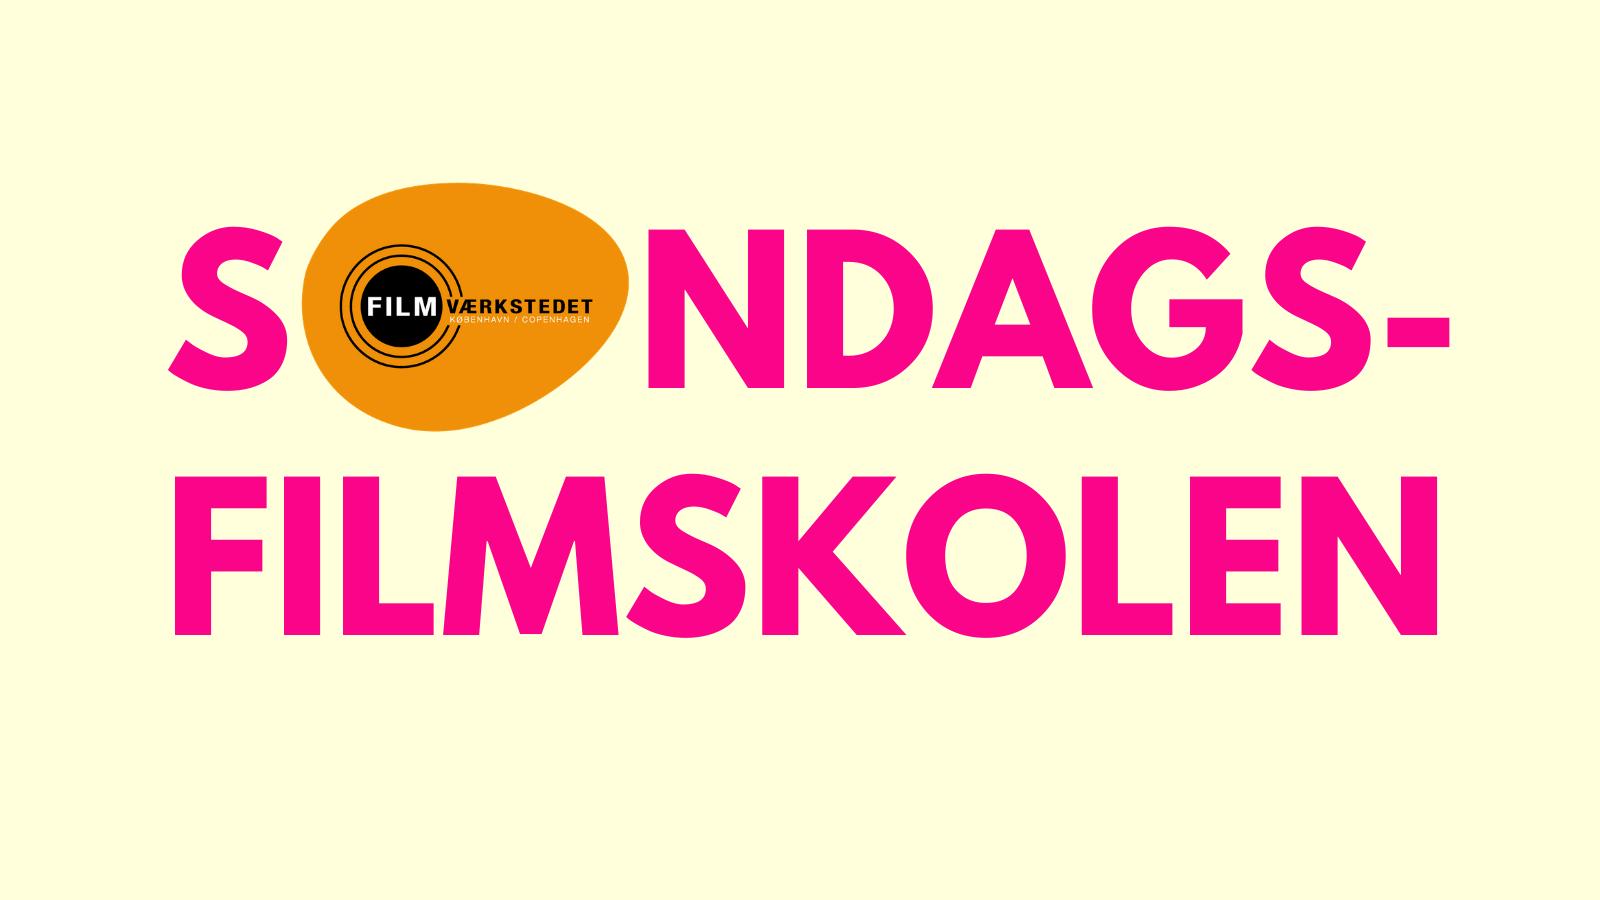 SØNDAGSFILMSKOLEN – 10.APRIL-31.OKTOBER